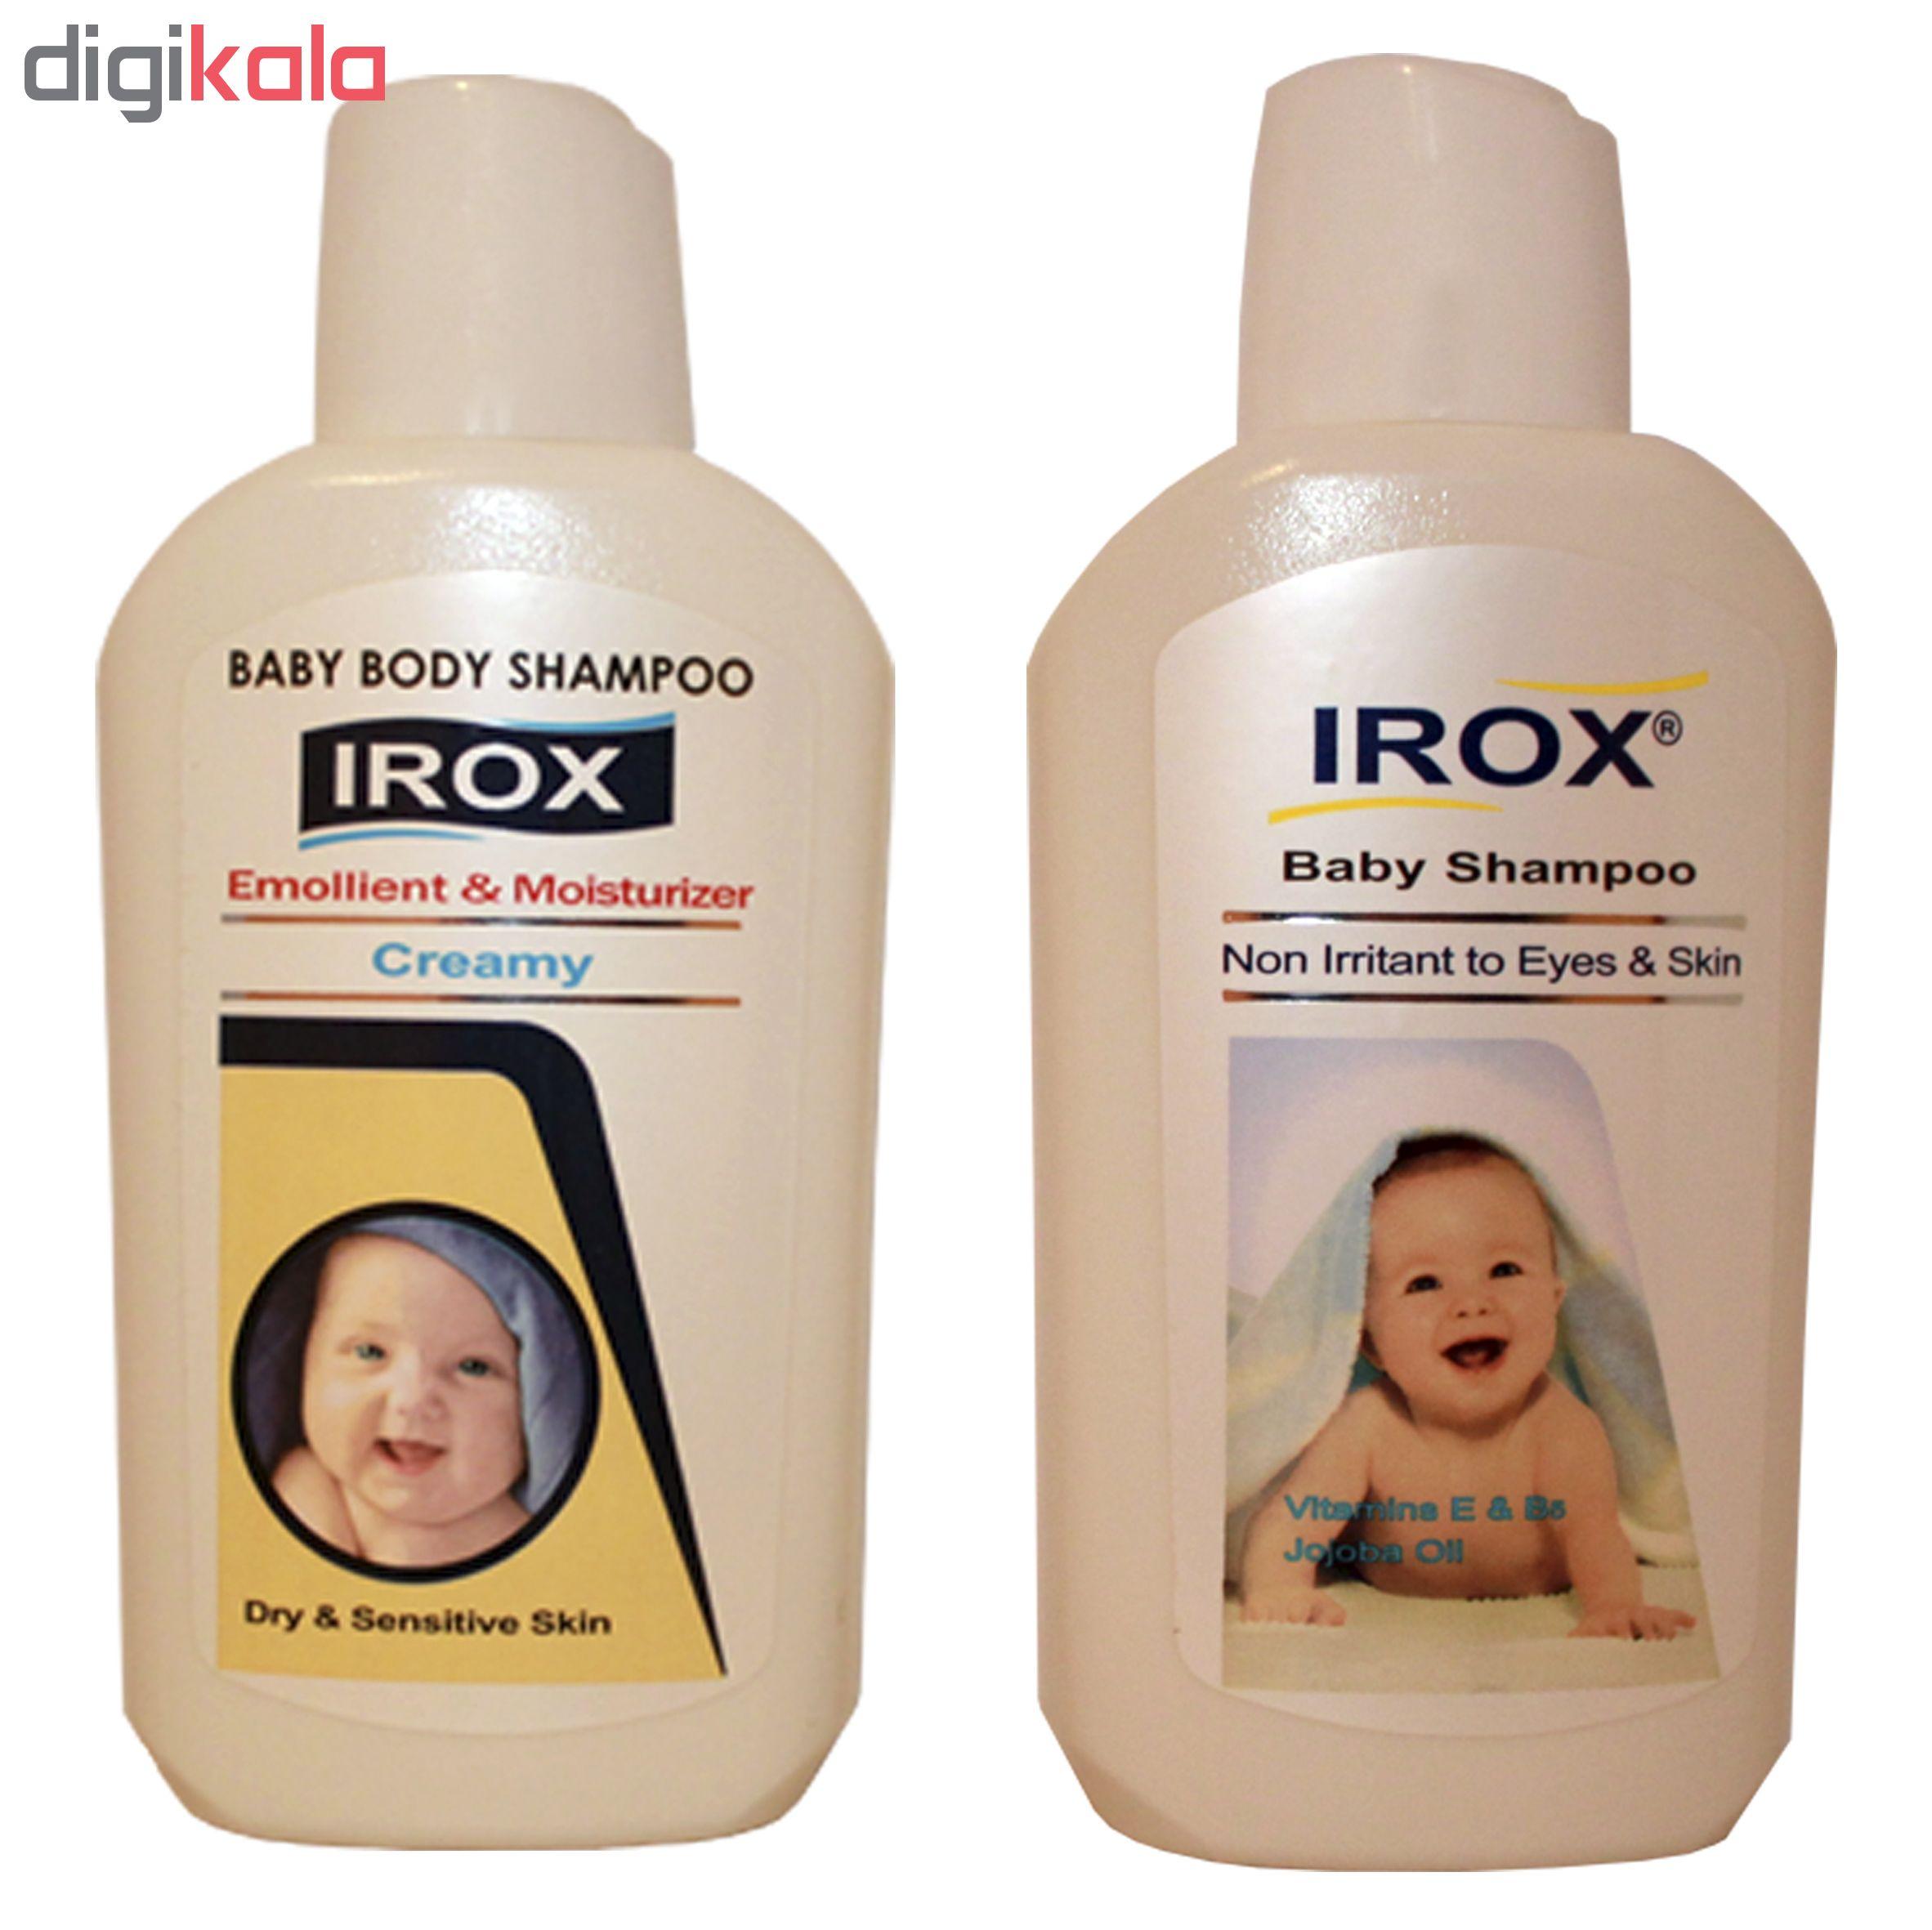 شامپو بدن کودک ایروکس مدل 01 حجم 0.2 لیتر به همراه شامپو سر کودک